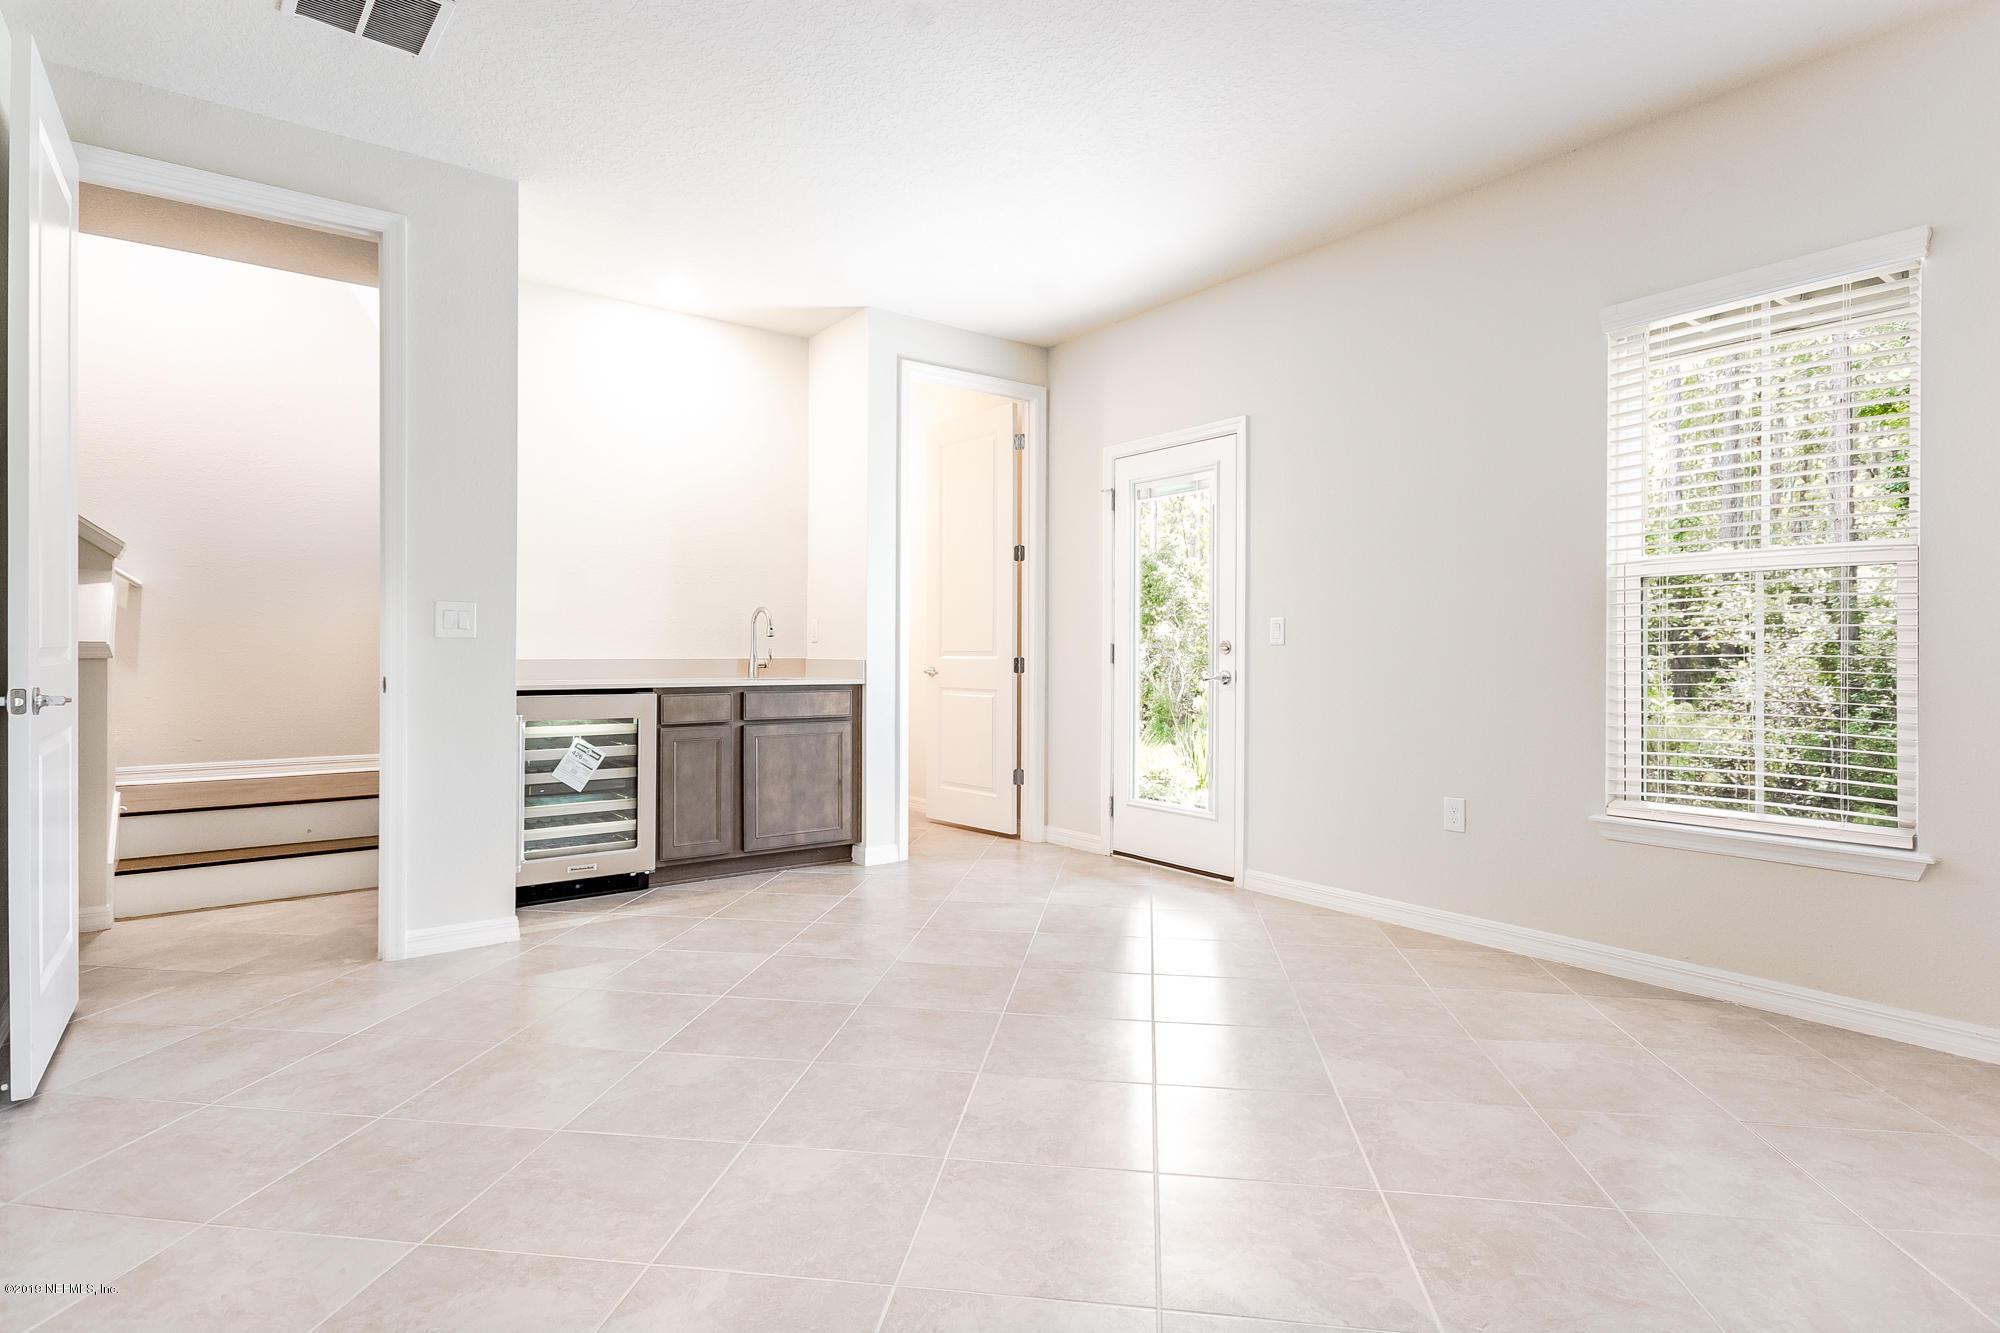 83 SPRING TIDE, PONTE VEDRA, FLORIDA 32081, 3 Bedrooms Bedrooms, ,2 BathroomsBathrooms,Condo,For sale,SPRING TIDE,1011116